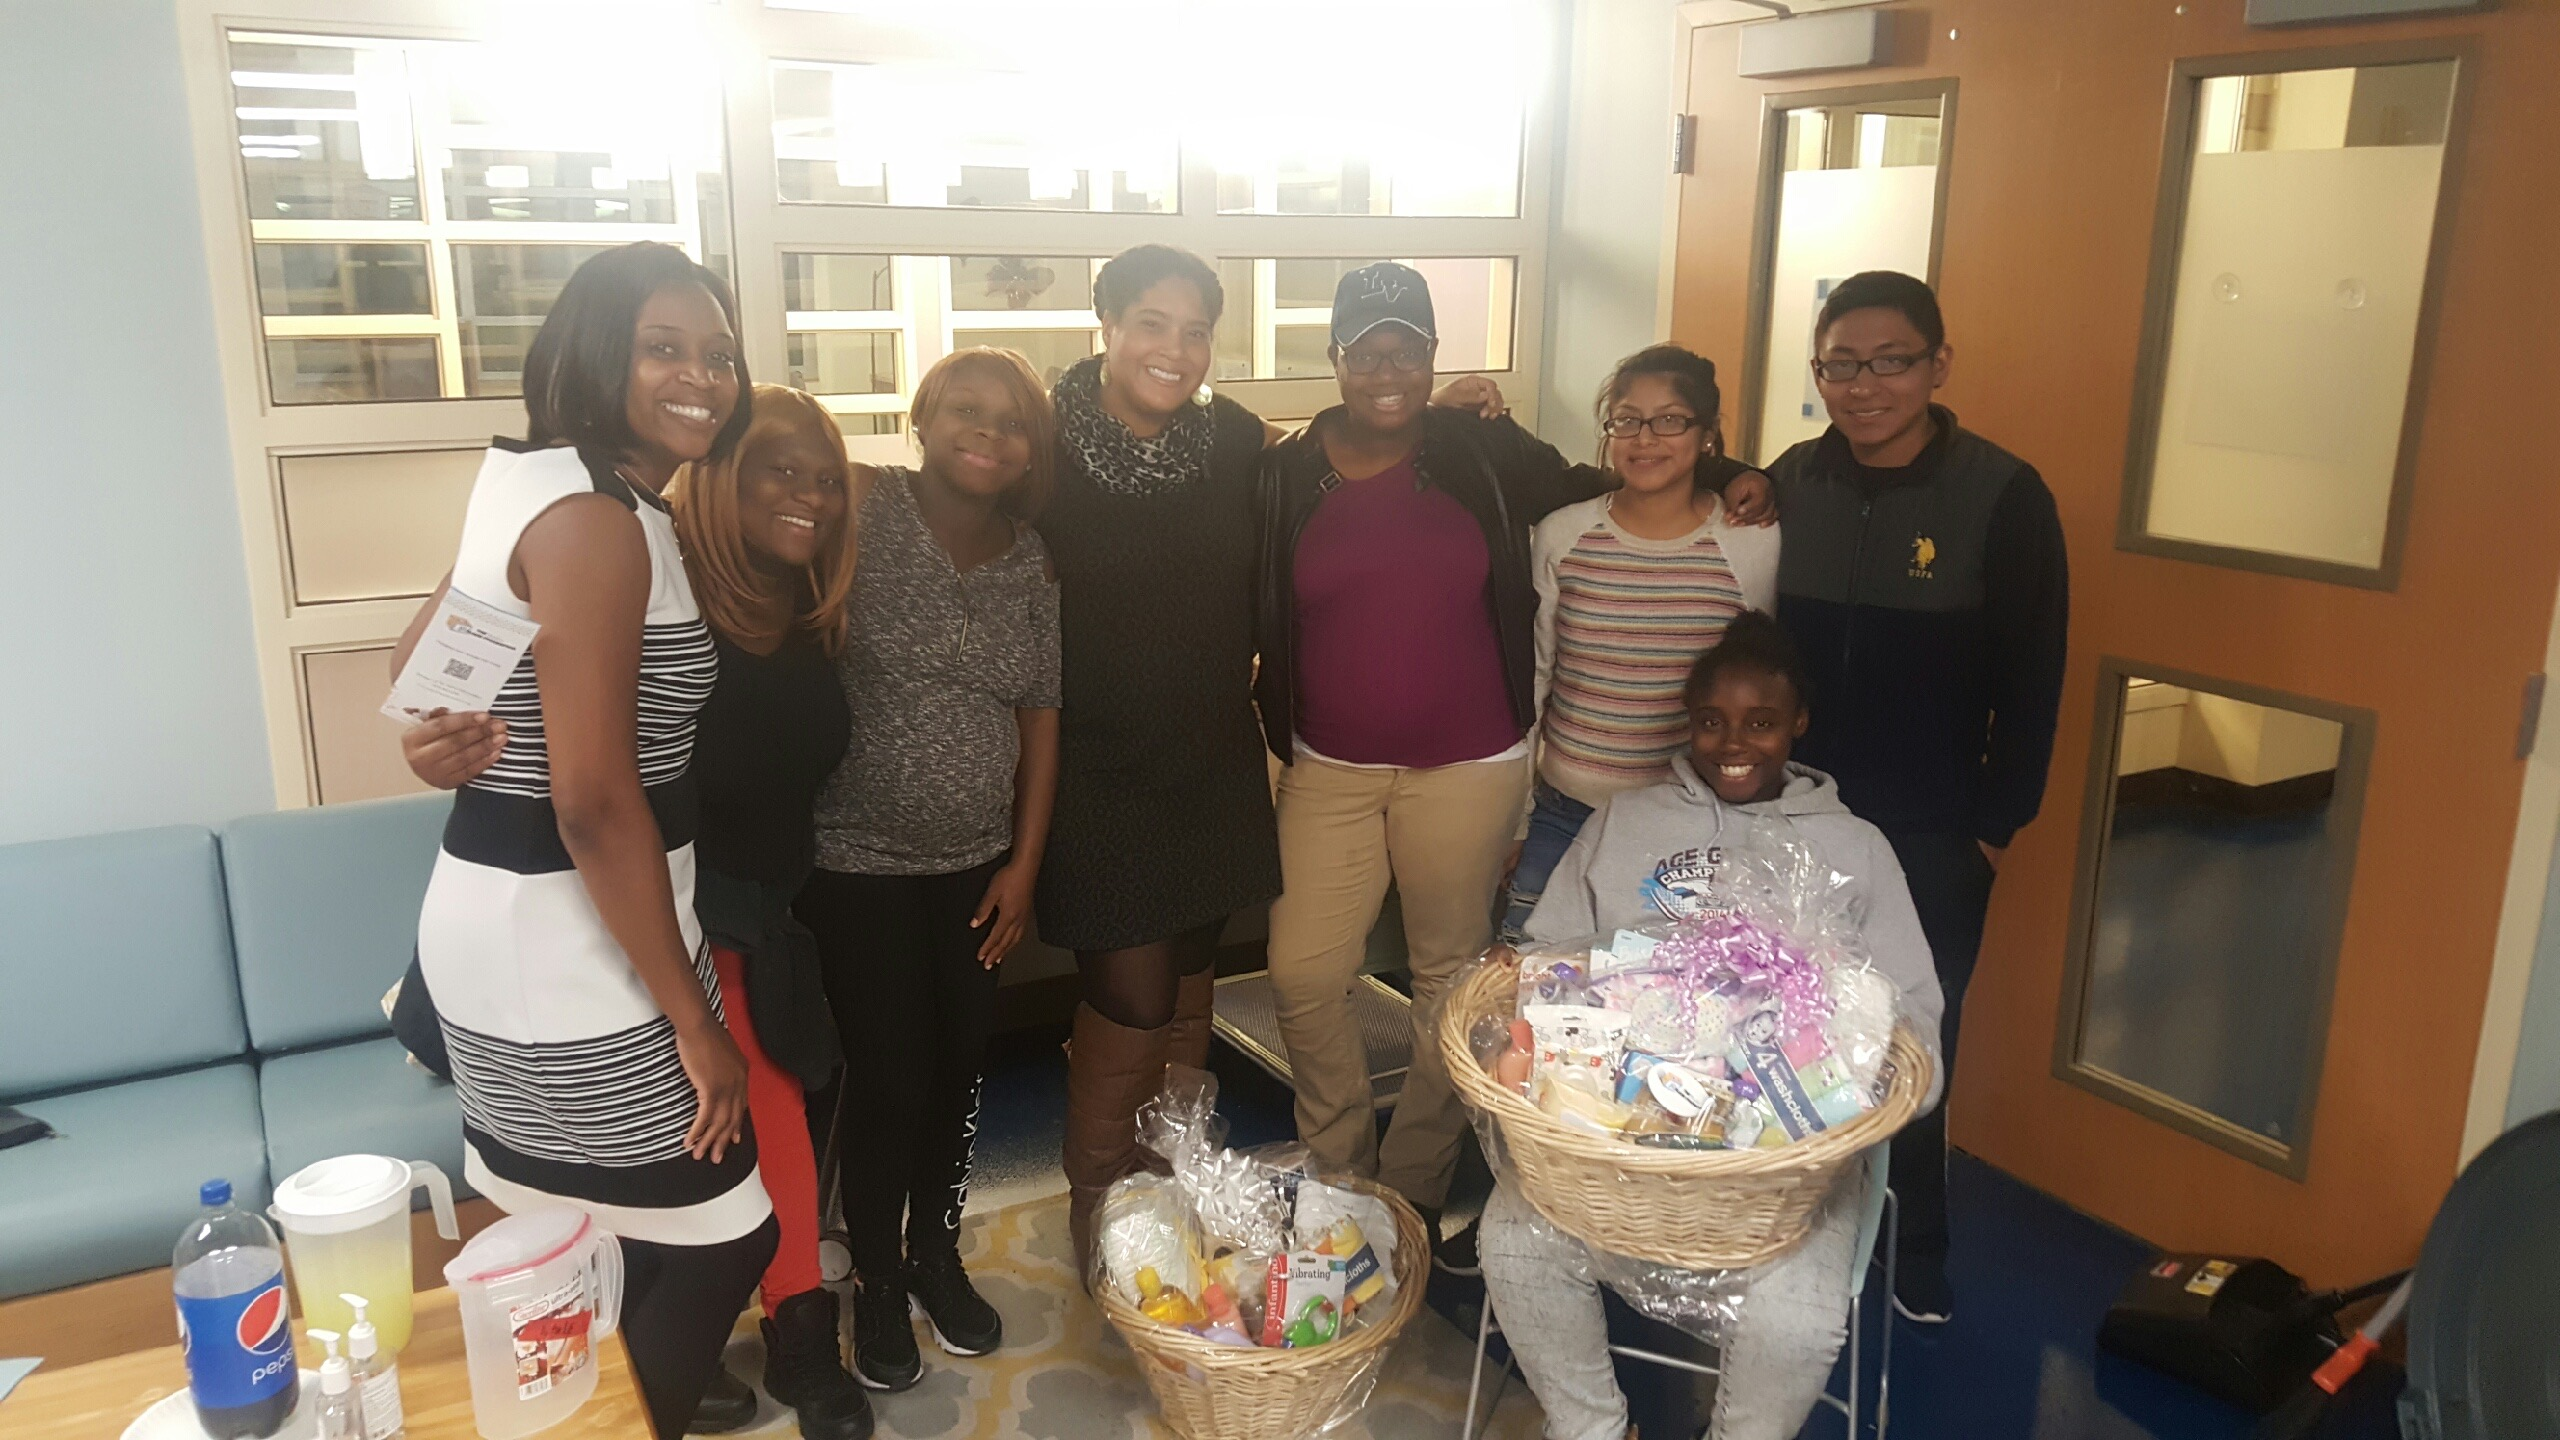 New Moms Prenatal Class Basket Giveaway